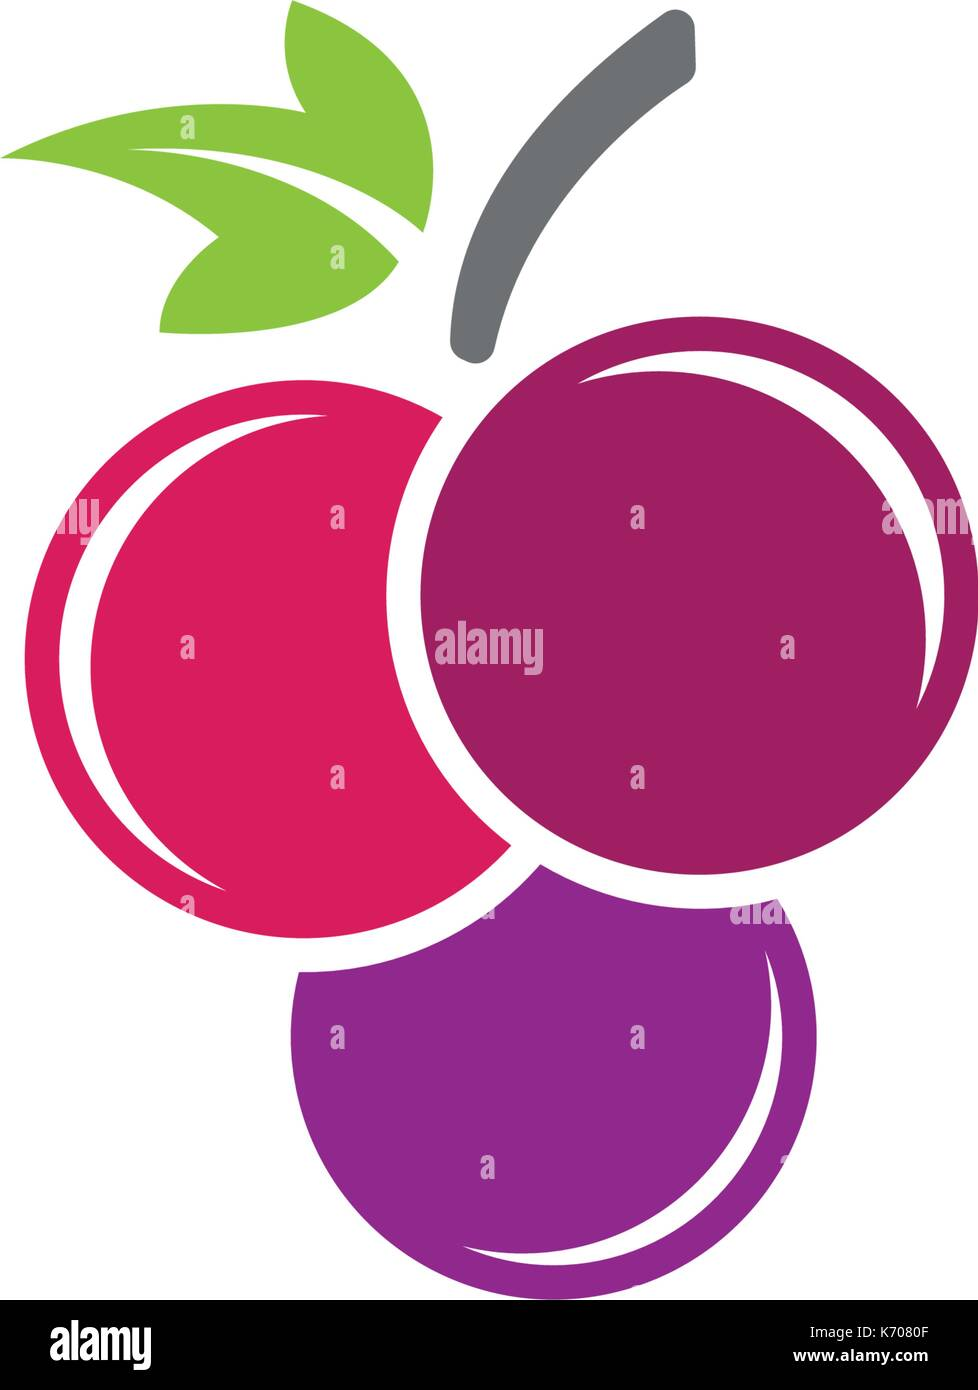 Grapes logo template vector icon illustration design - Stock Vector